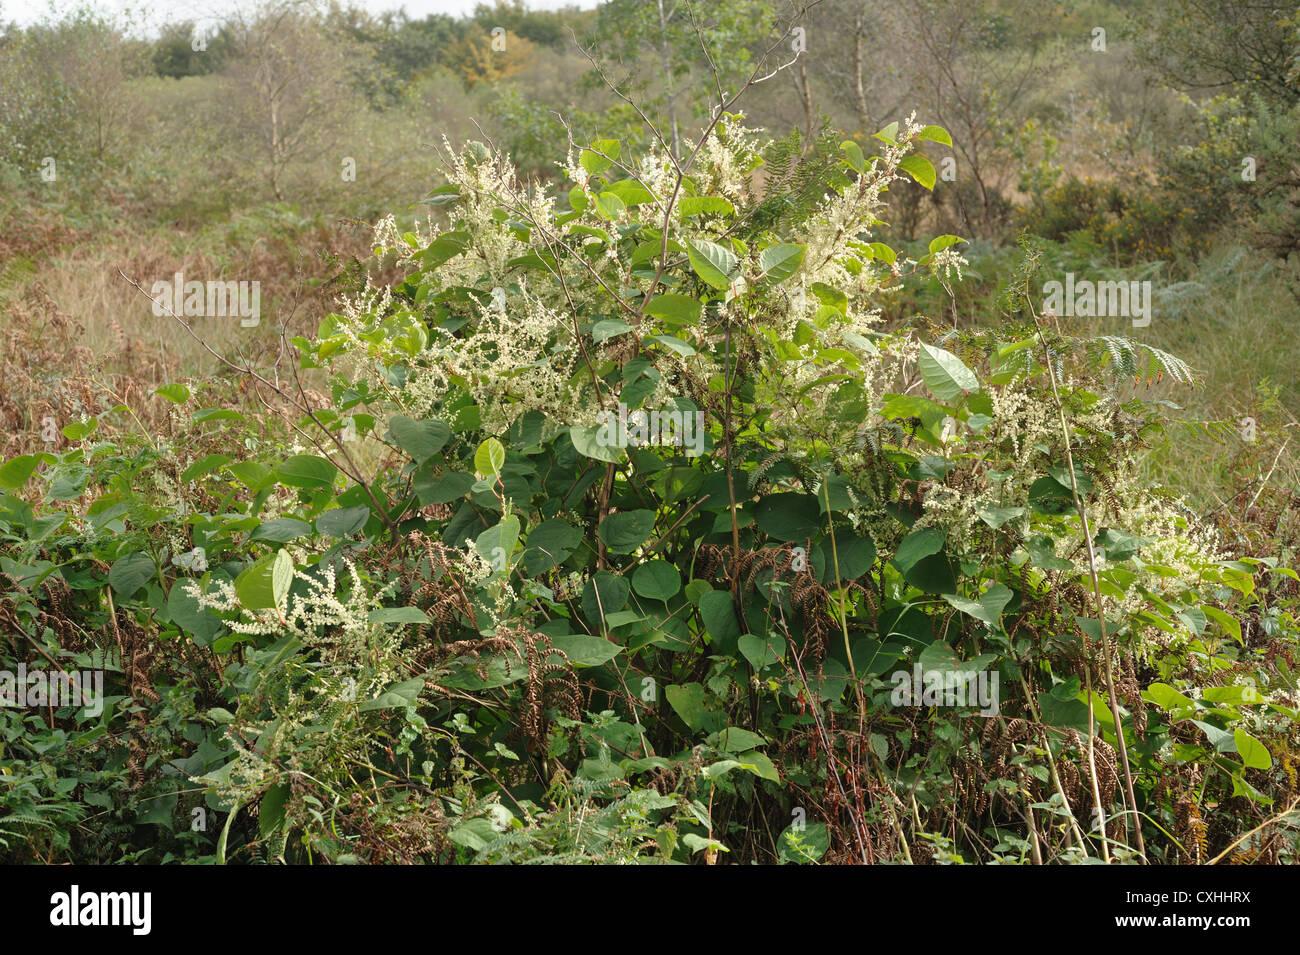 Japanese knotweed Fallopia japonica flowering plants - Stock Image